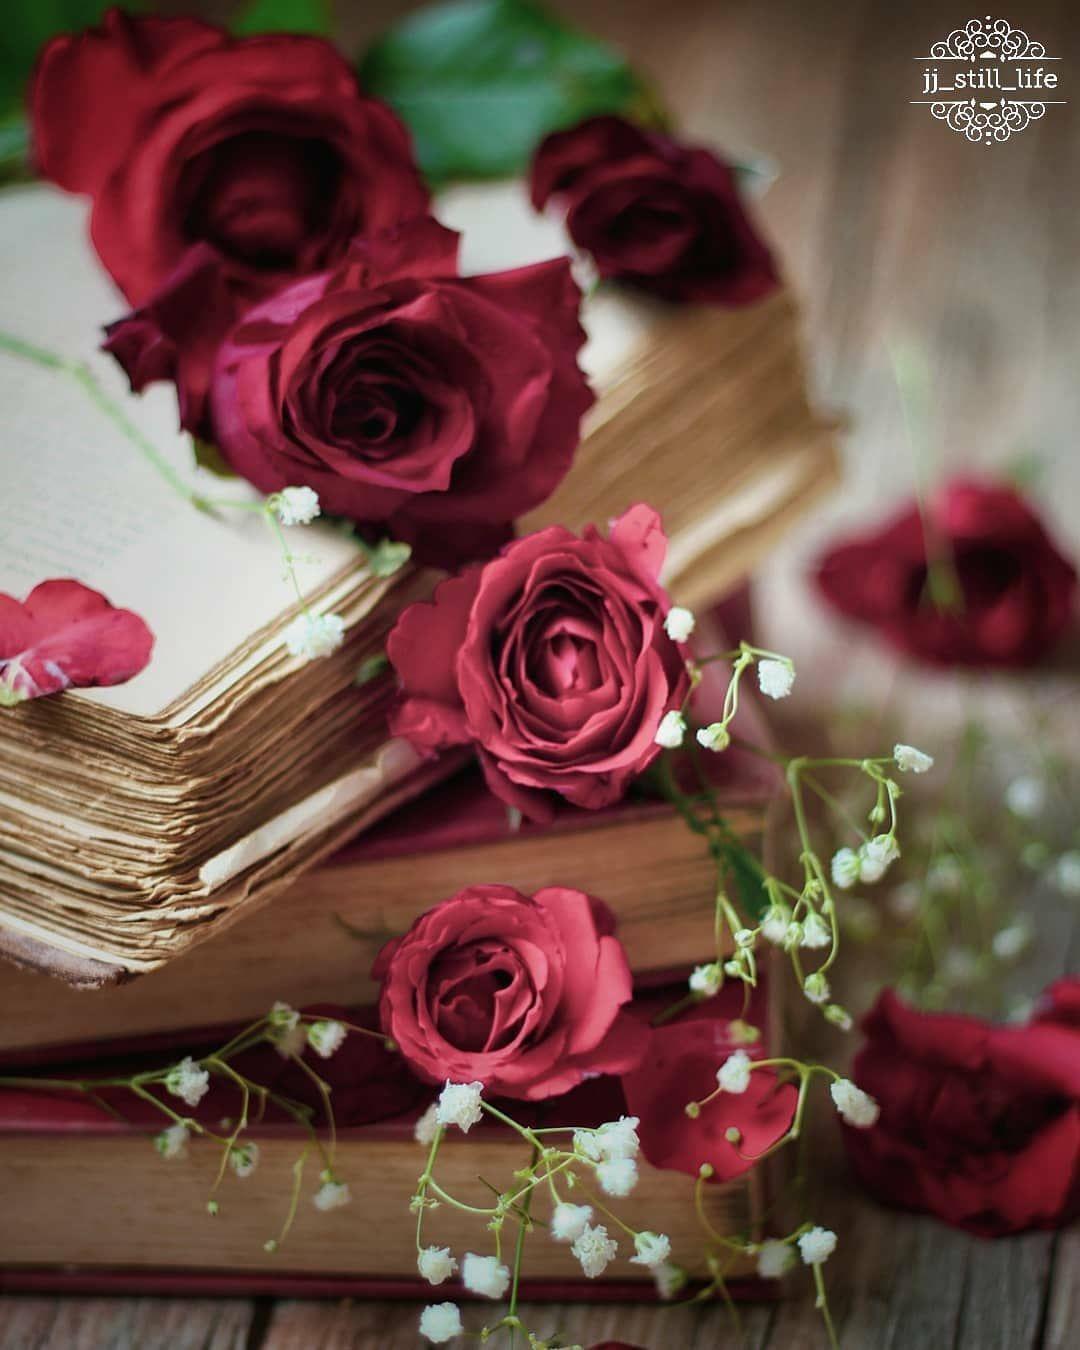 Izobrazhenieto Mozhe Da Sdrzha Cvete Beautiful Rose Flowers Book Flowers Flowers Photography